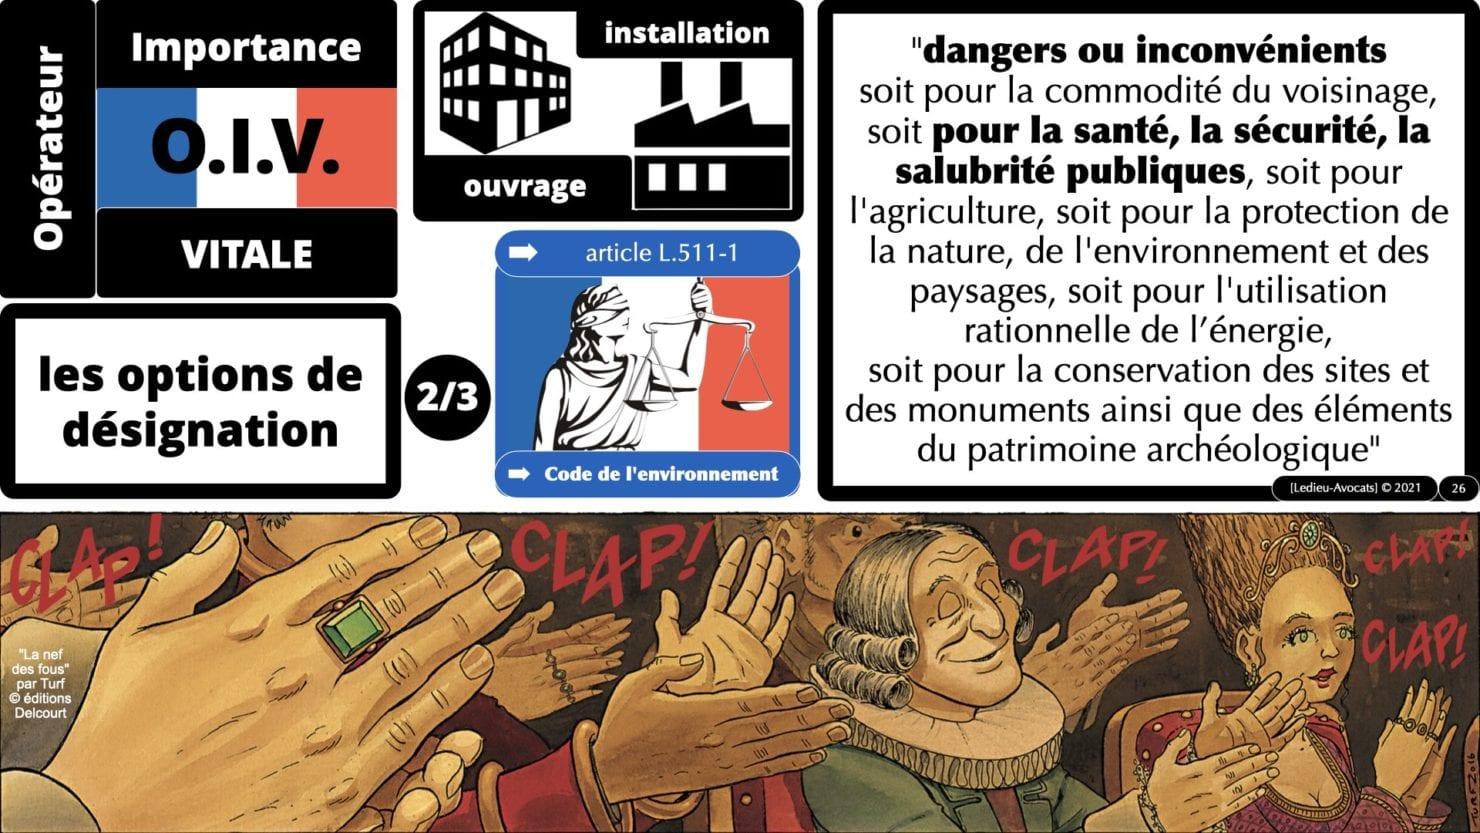 337 cyber sécurité #1 OIV OSE Critical Entities © Ledieu-avocat 15-06-2021.026